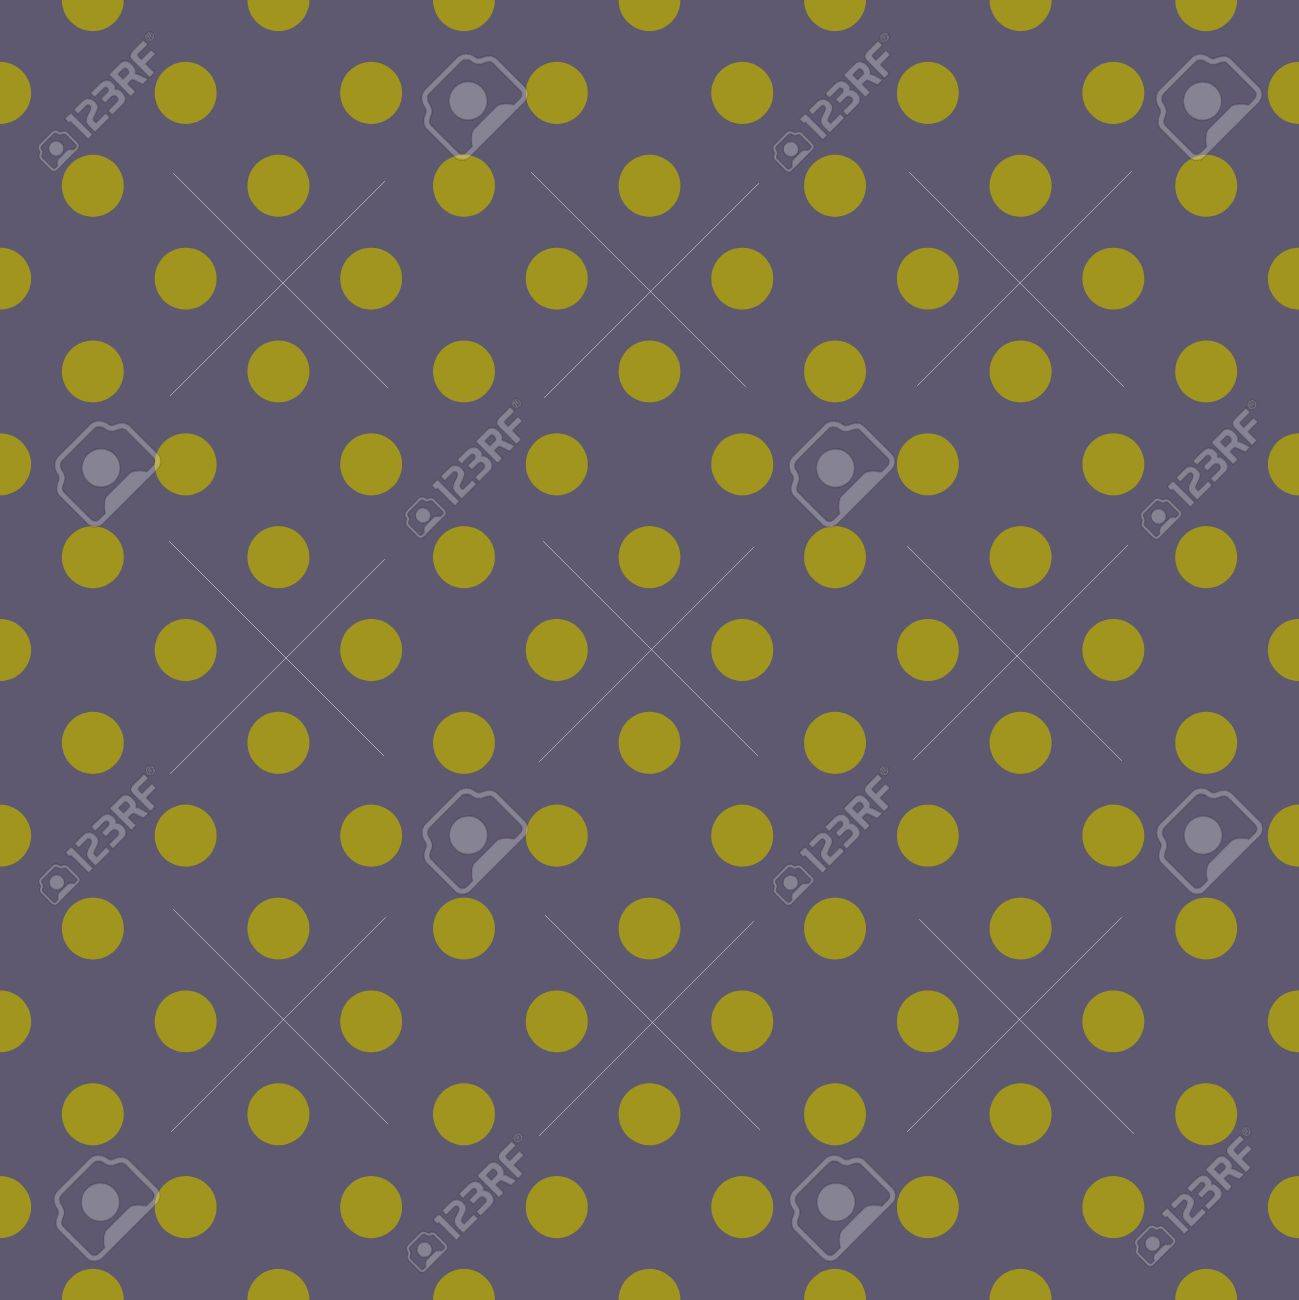 Fantastic Wallpaper Halloween Polka Dot - 33237855-navy-blue-vector-background-with-green-polka-dots-seamless-pattern-for-halloween-desktop-wallpaper-a  Snapshot_487425.jpg